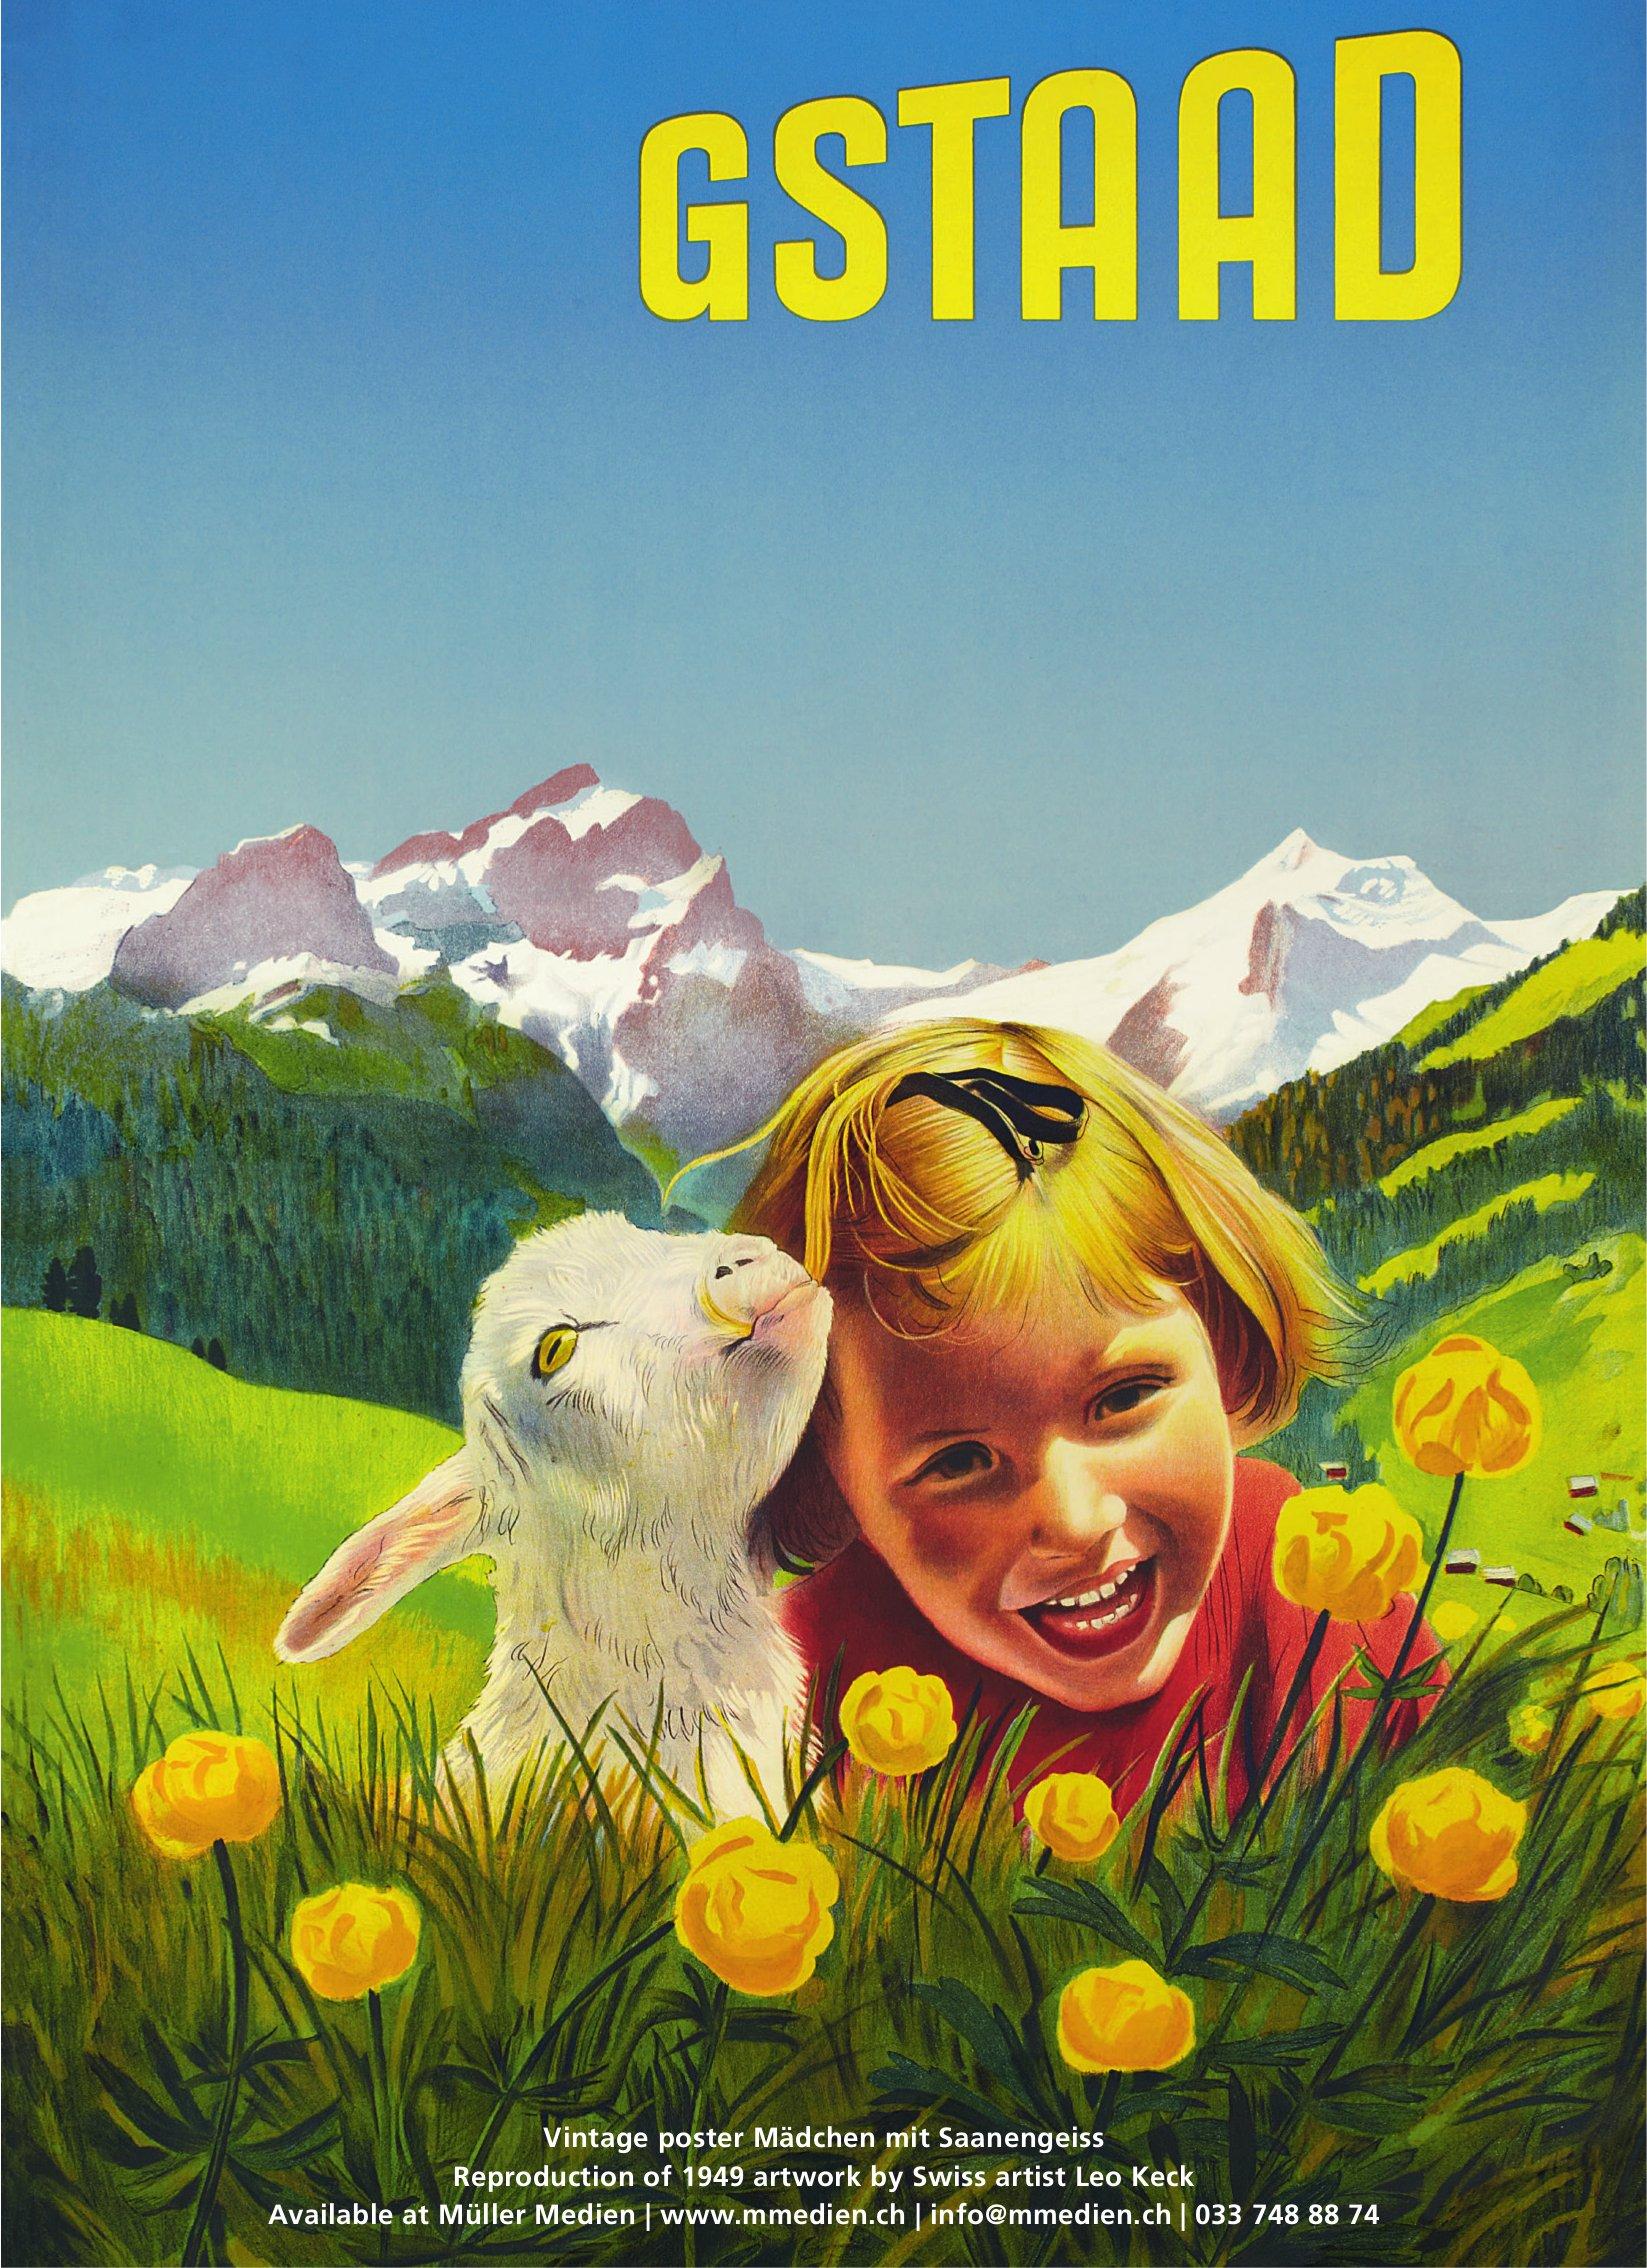 Gstaad - Vintage poster Mädchen mit Saanengeiss